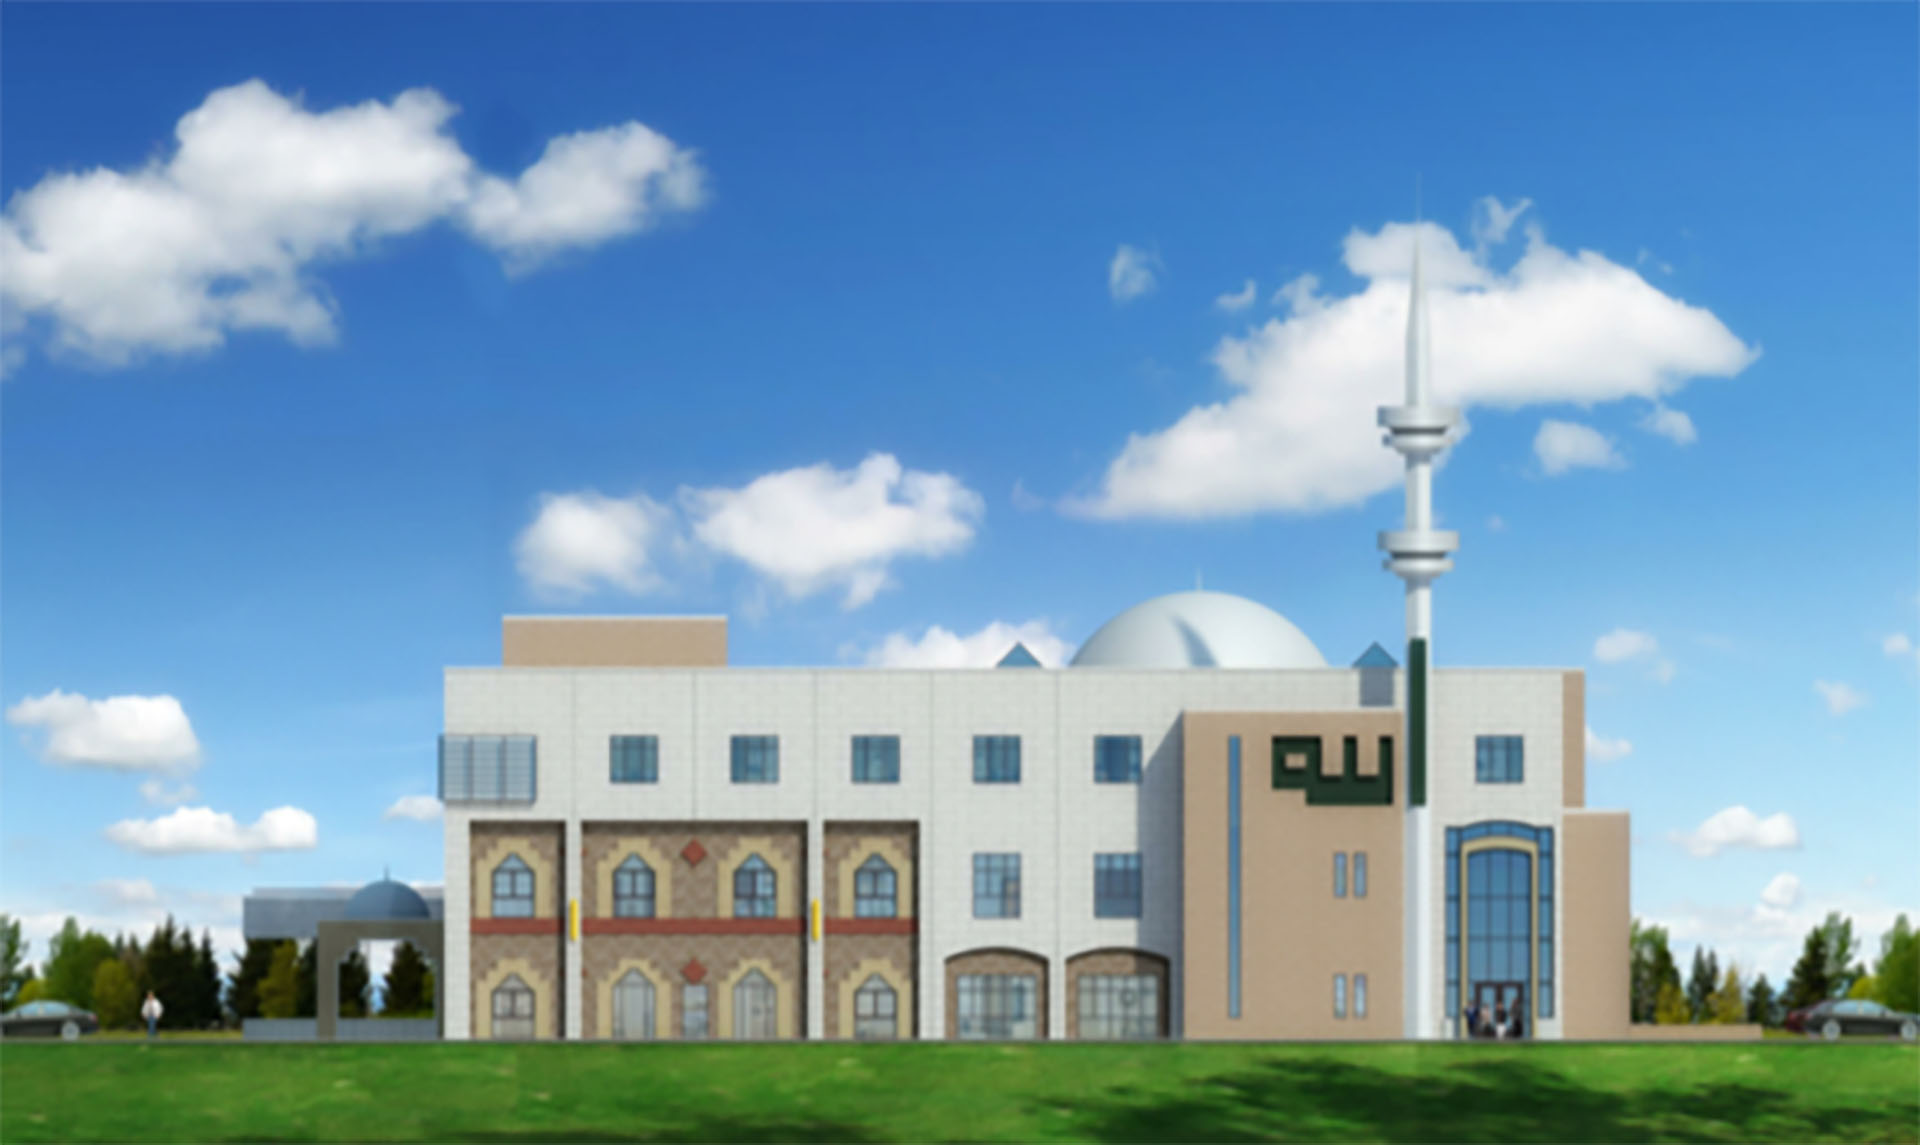 Mosque seeks expansion, area groups raise concerns